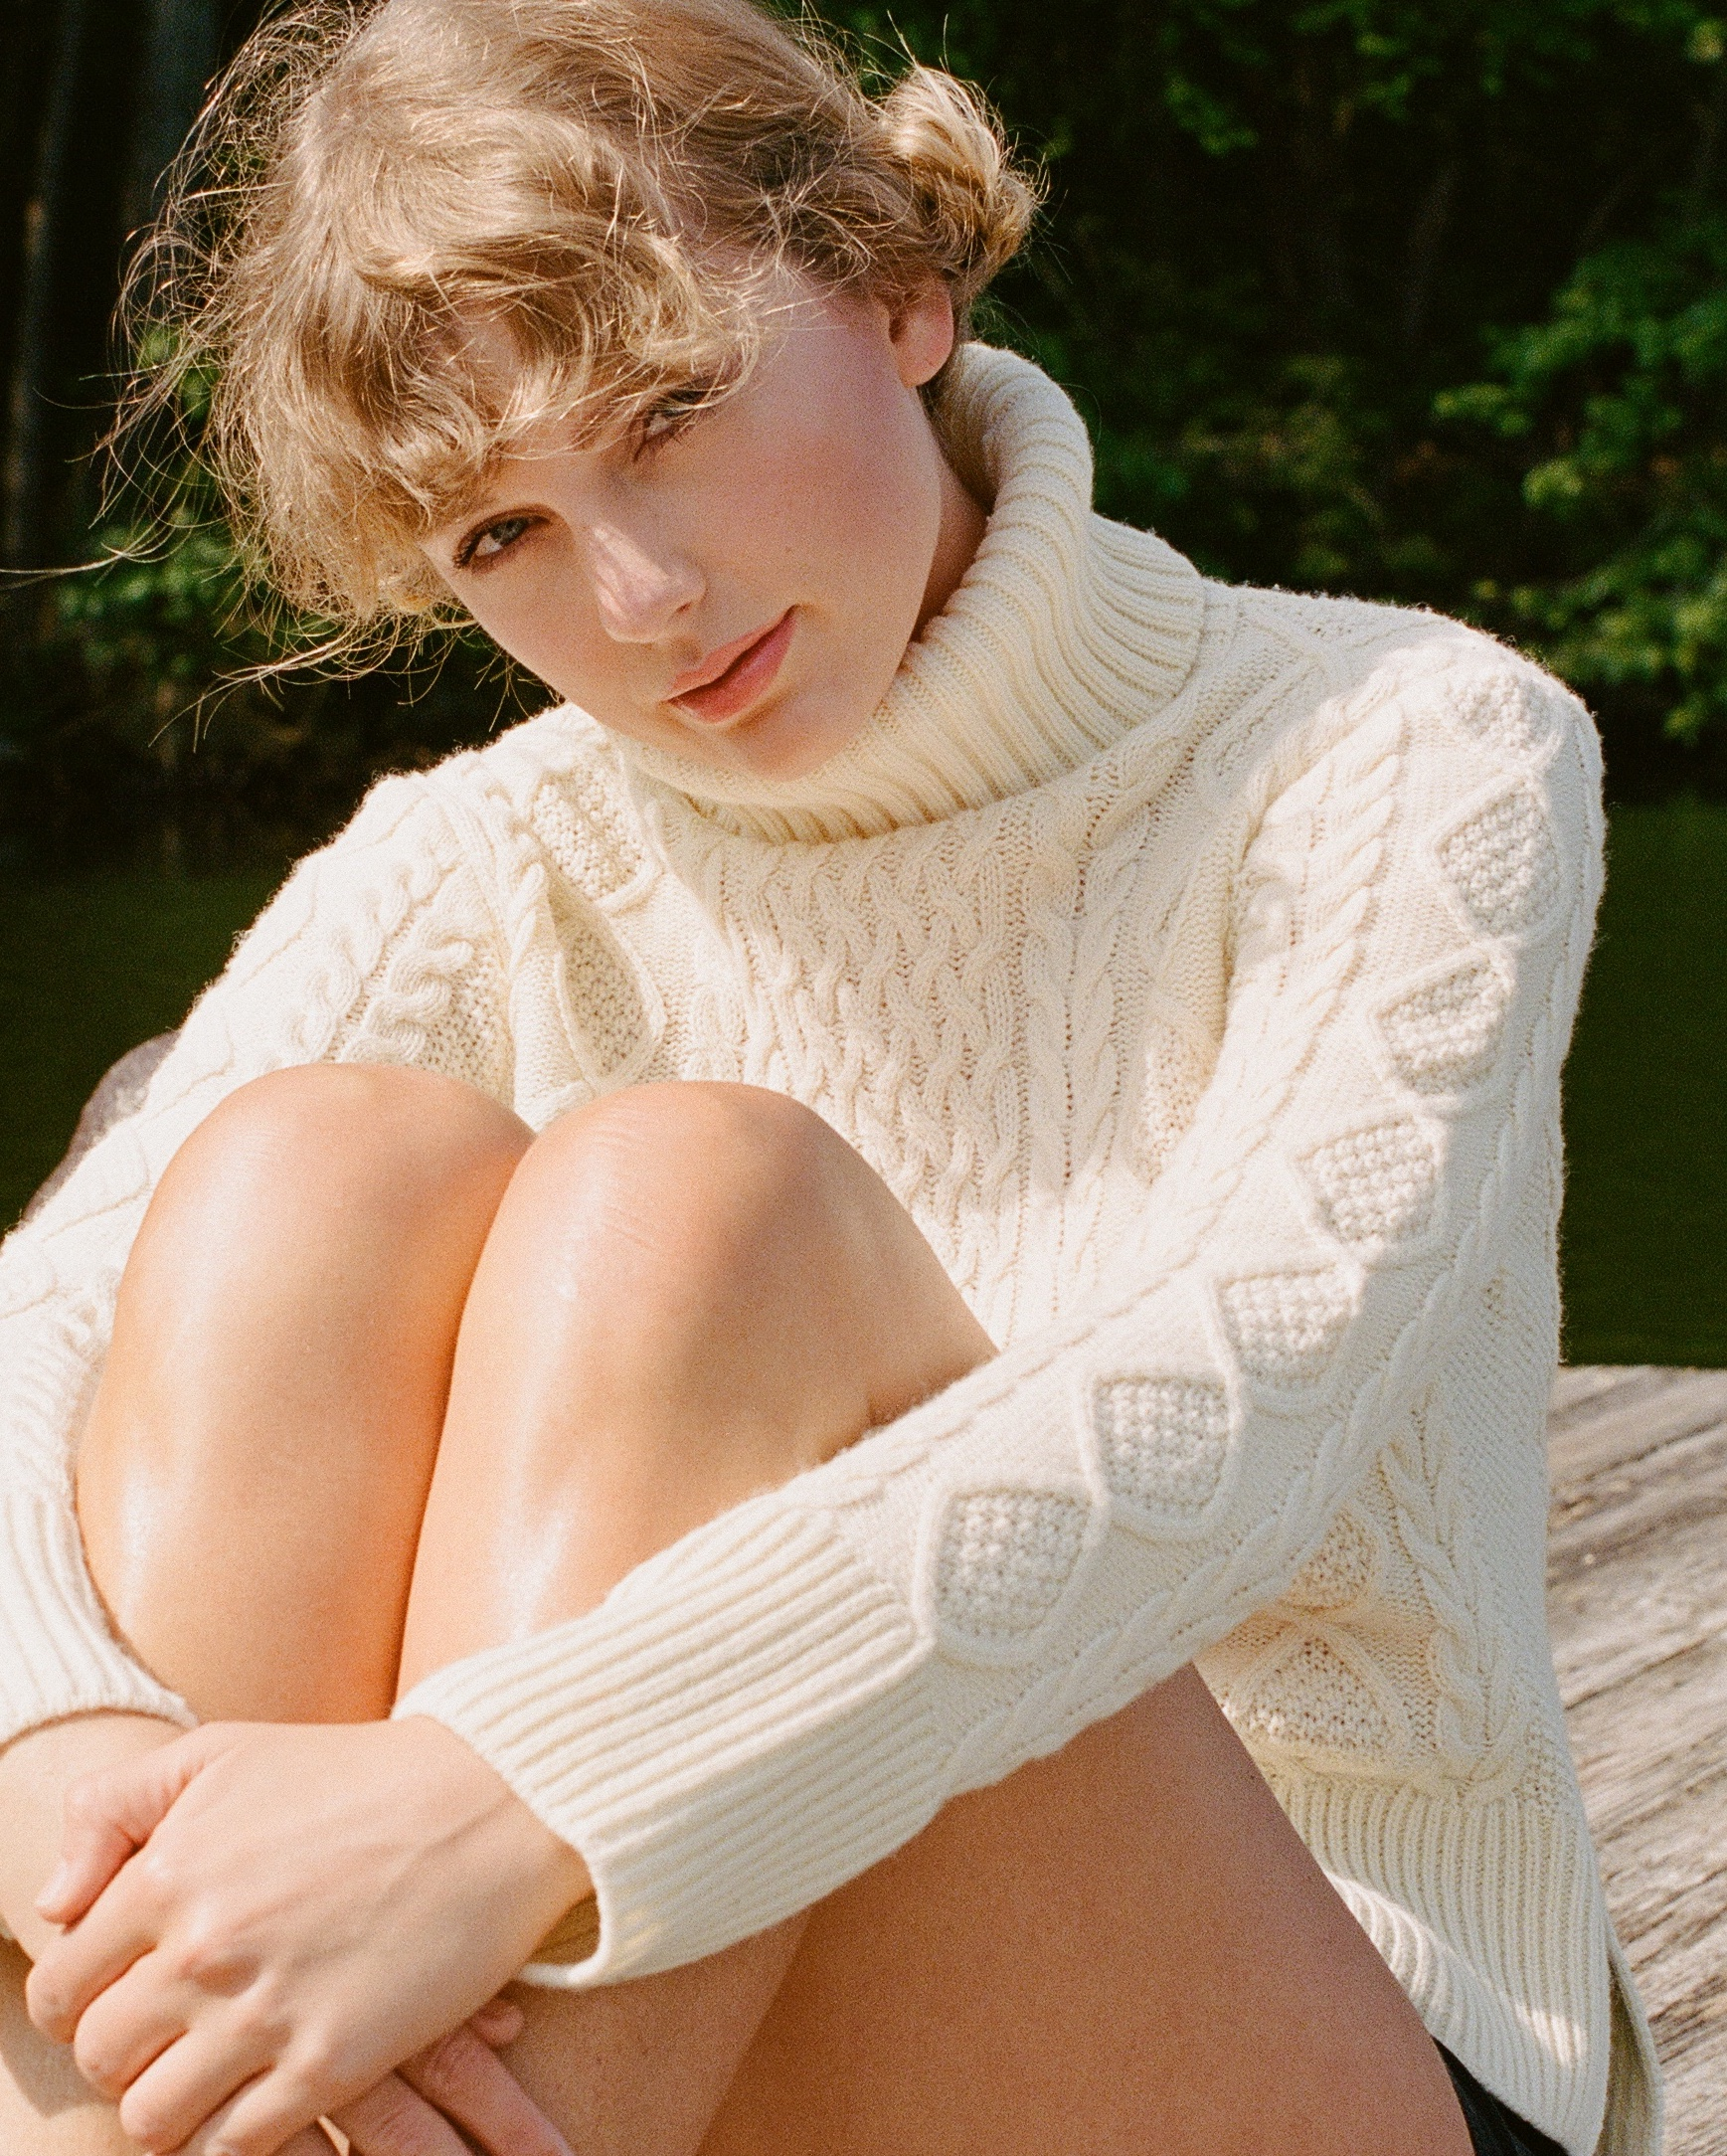 Taylor Swift Folklore promo image